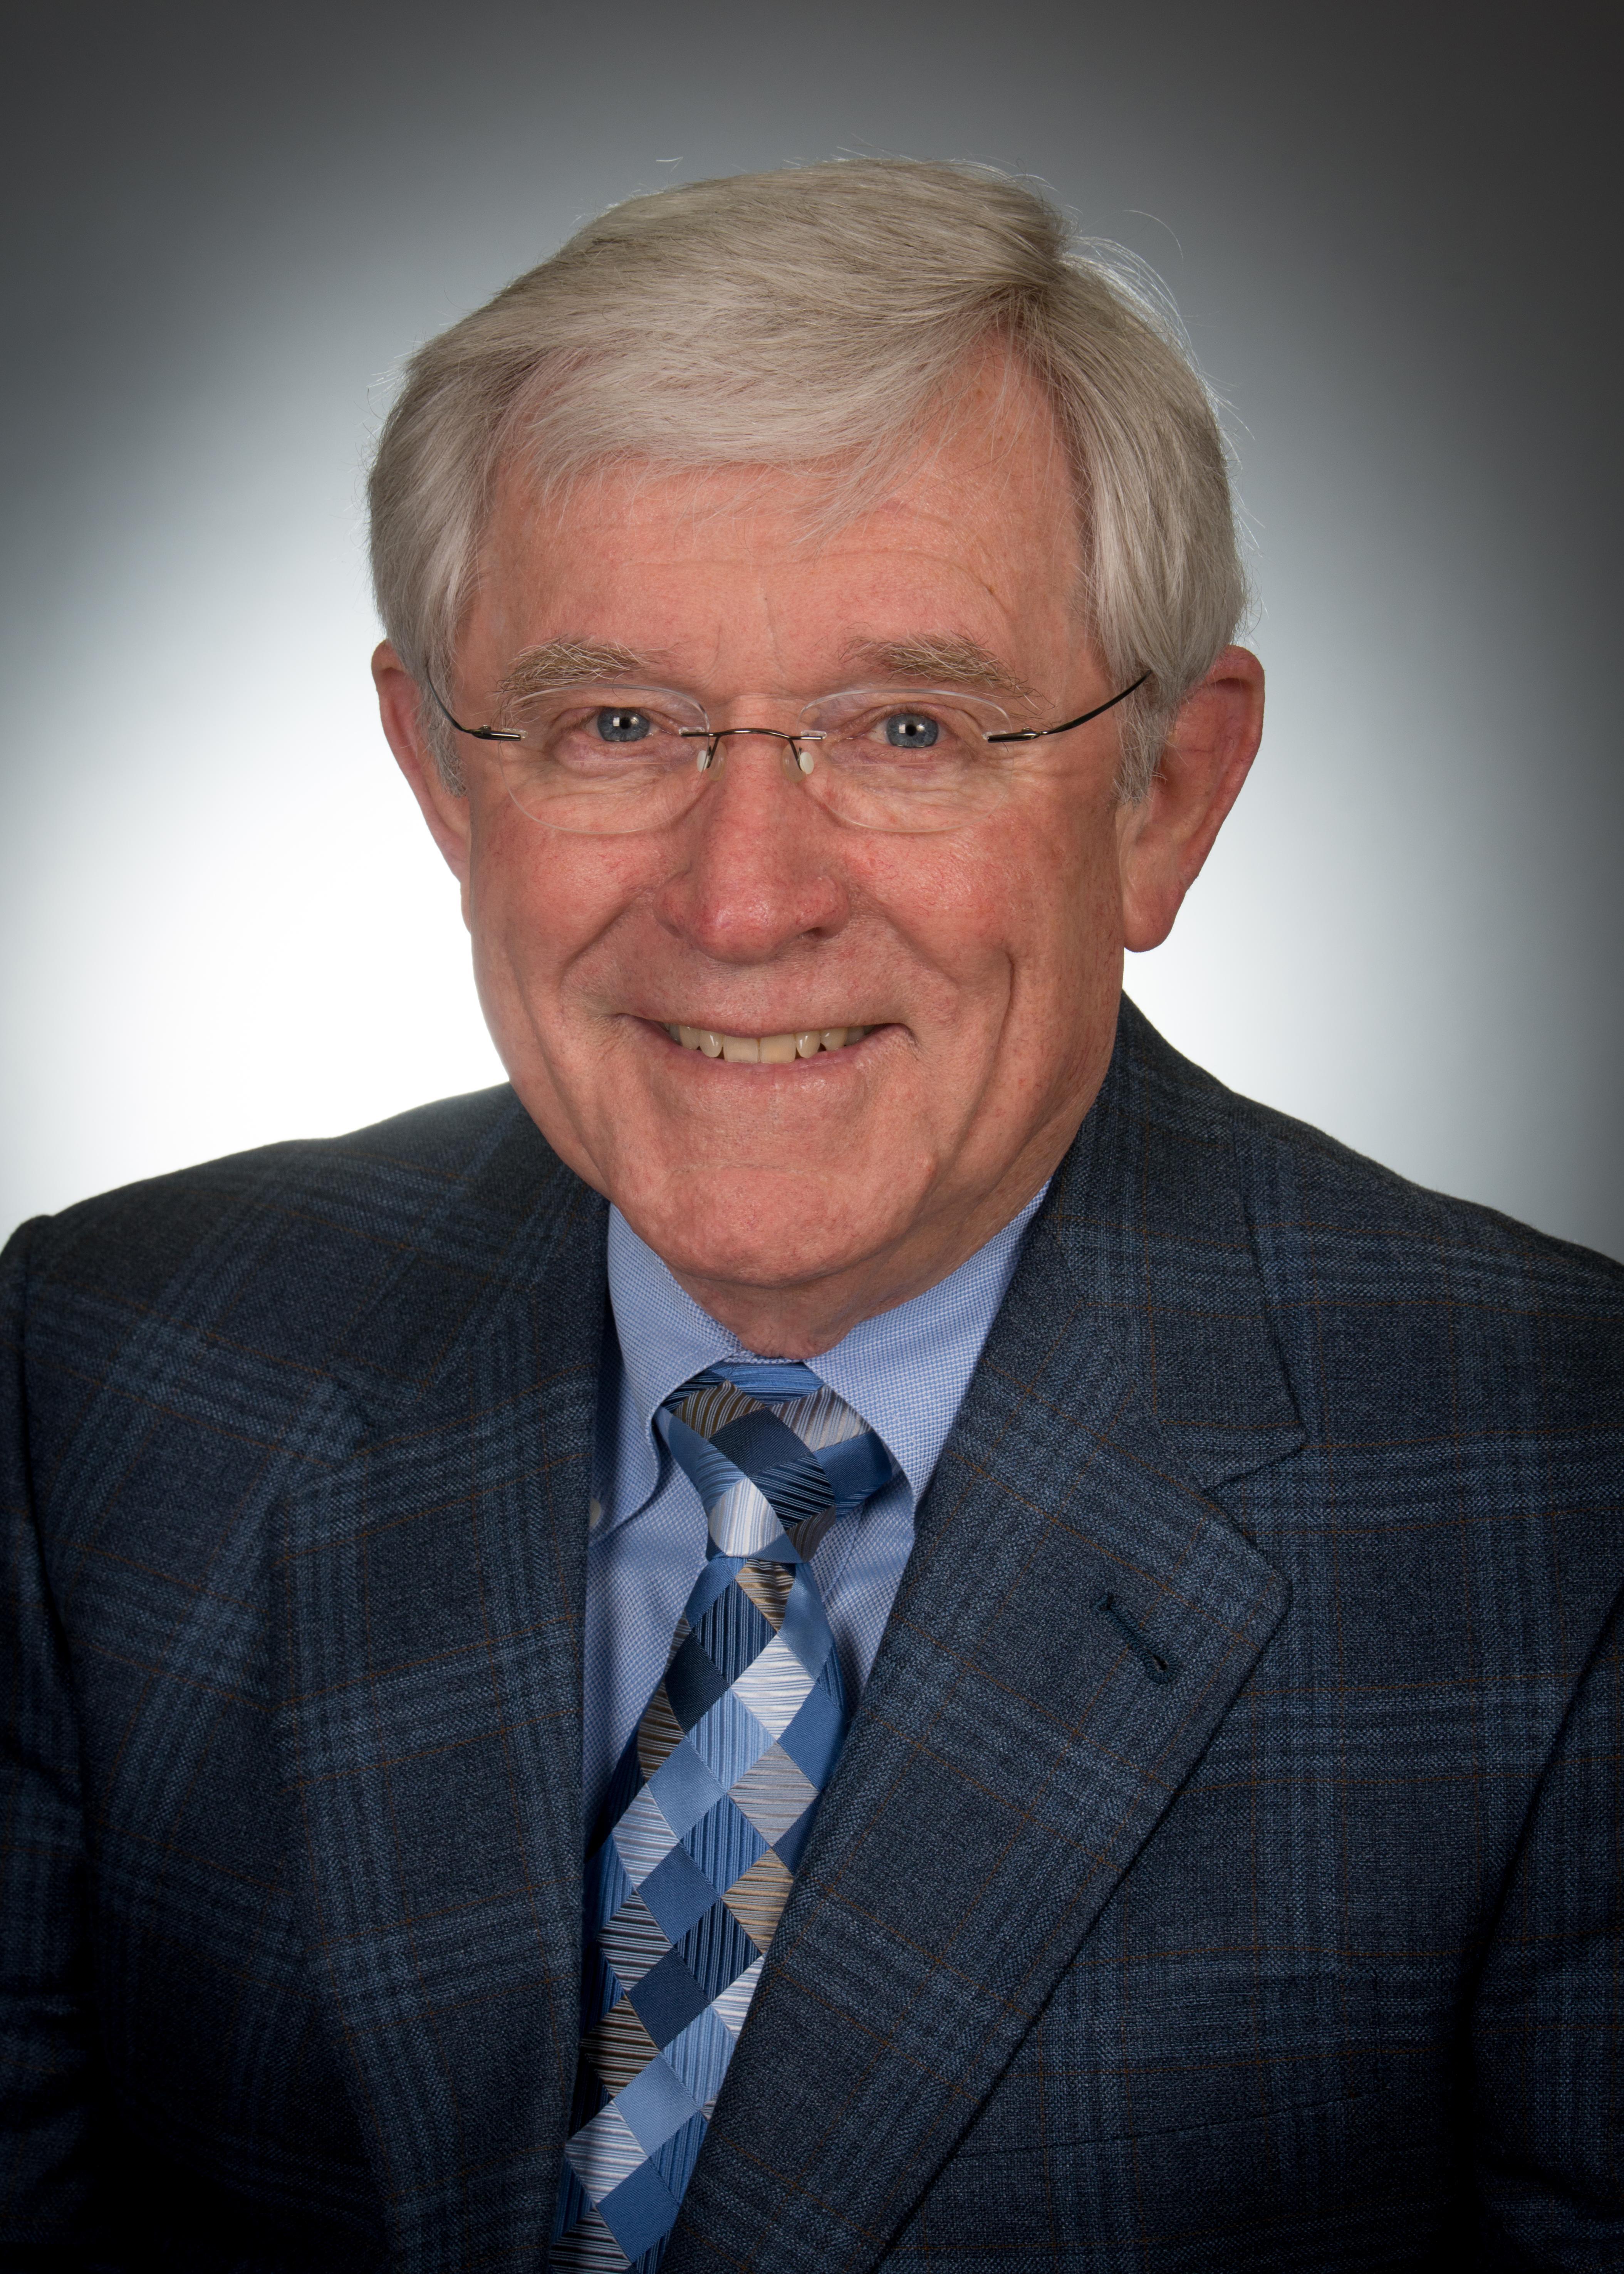 Jim Bingaman